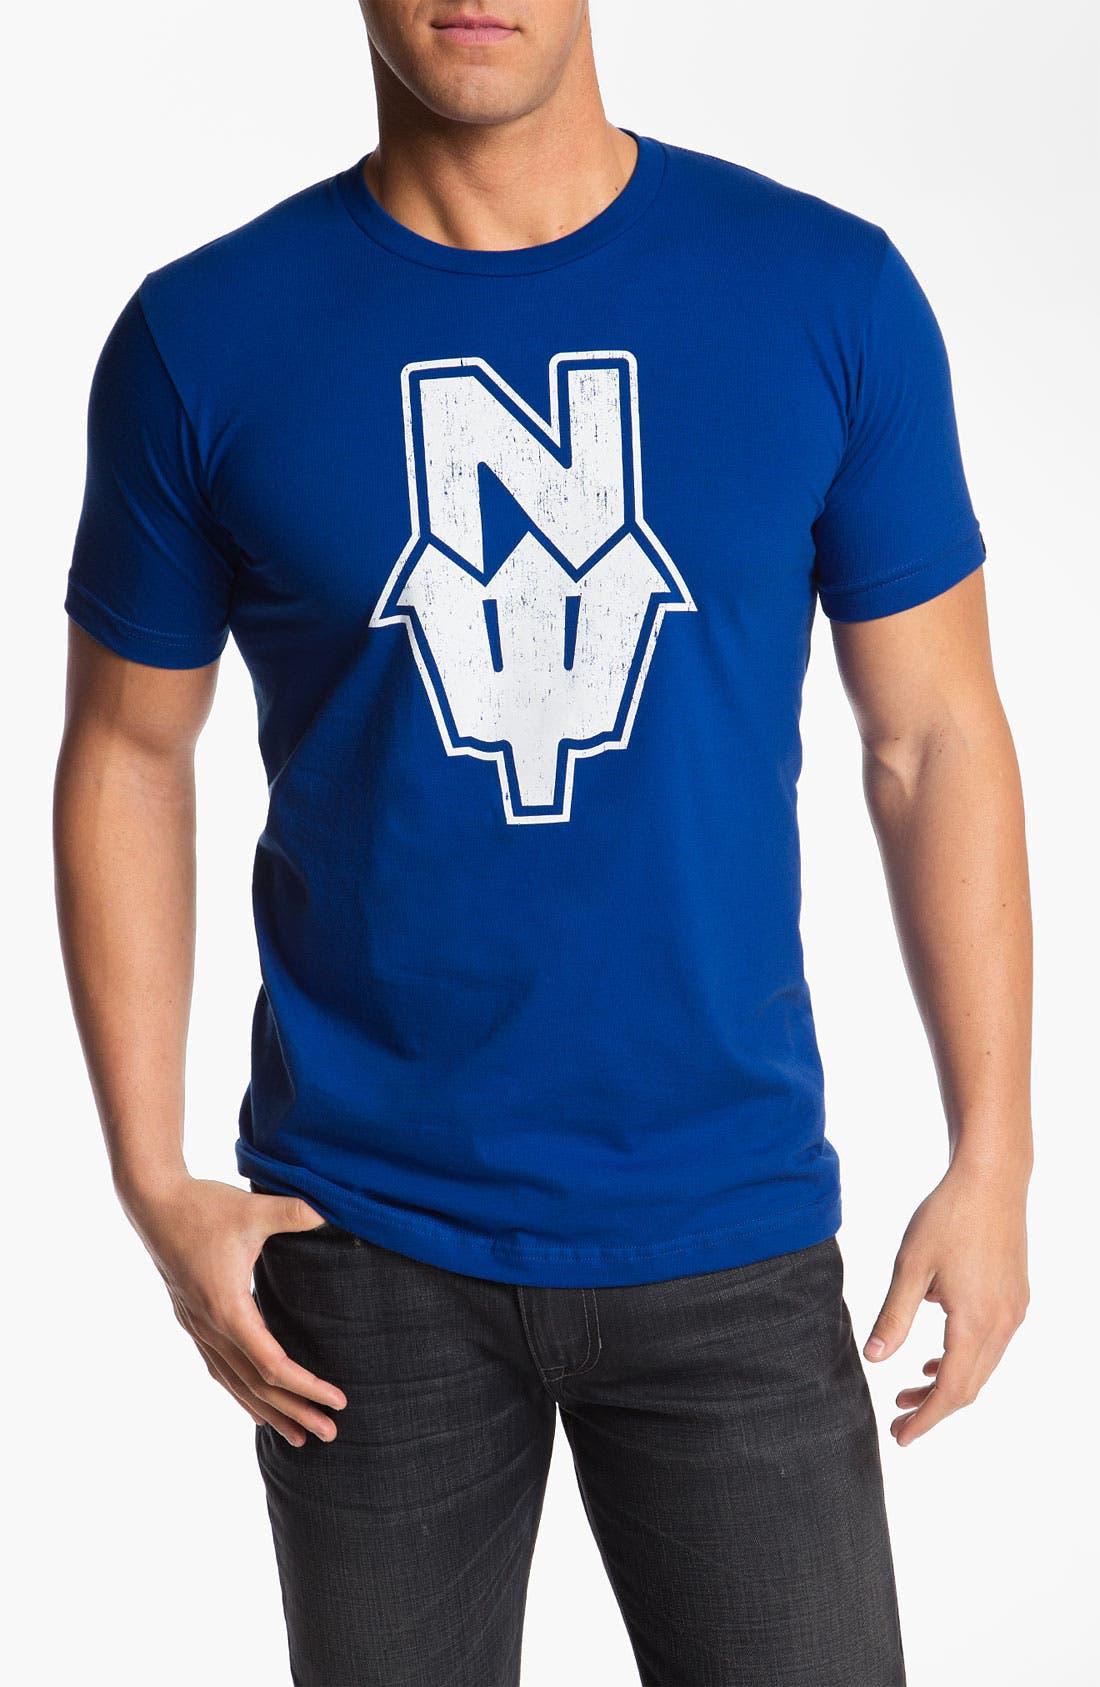 Main Image - Casual Industrees 'N. Dub' Graphic Crewneck T-Shirt